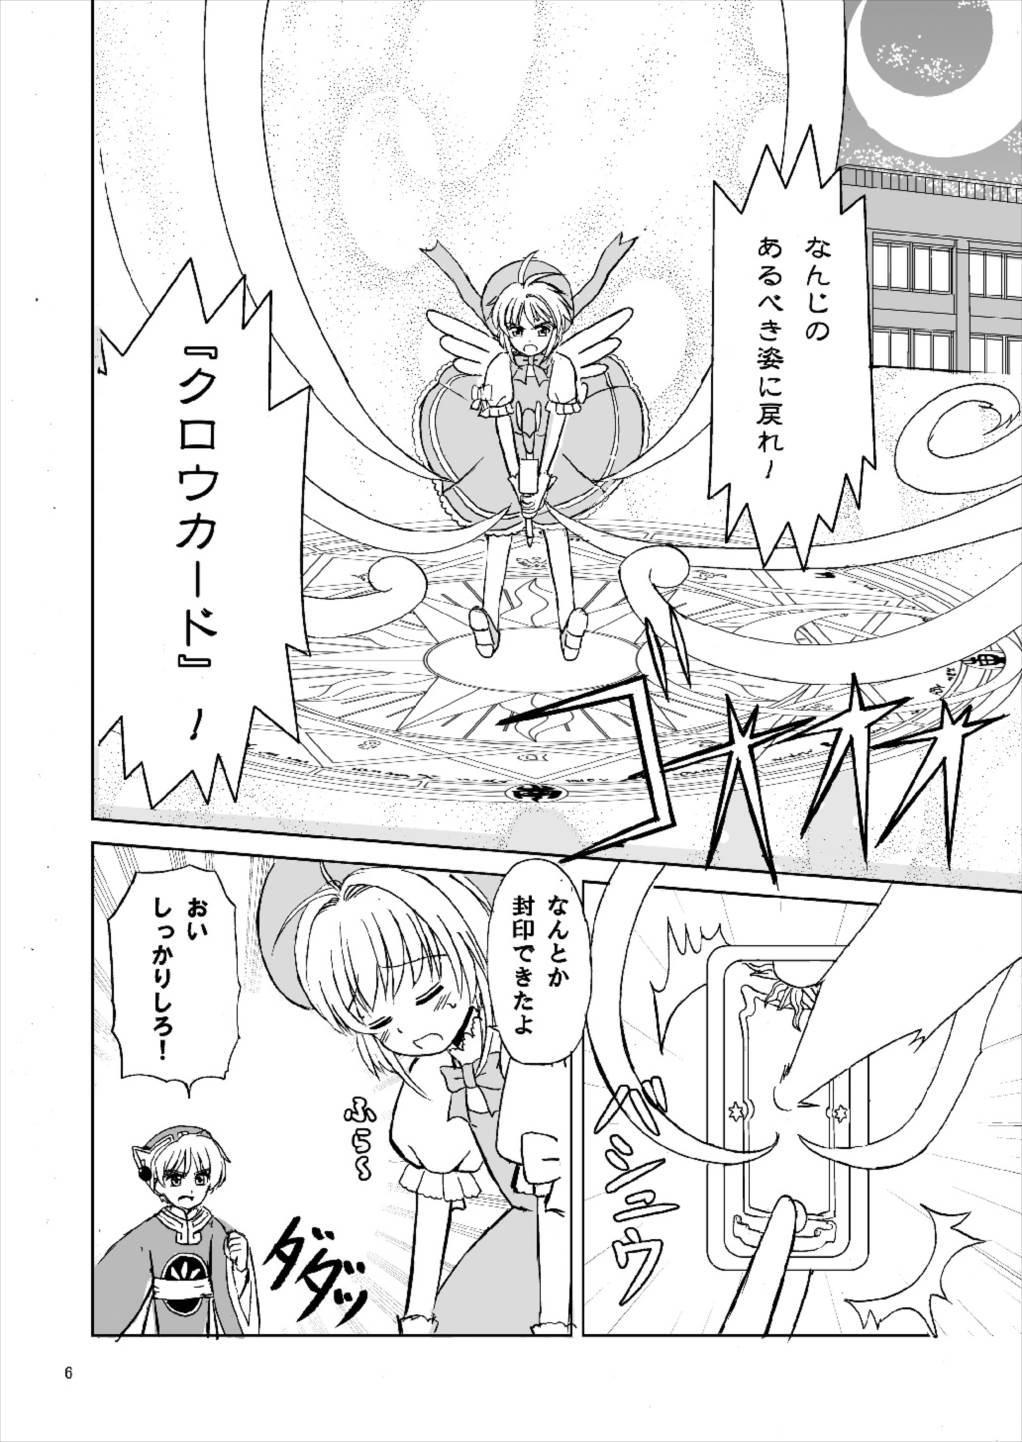 Sakura to Issho! 5